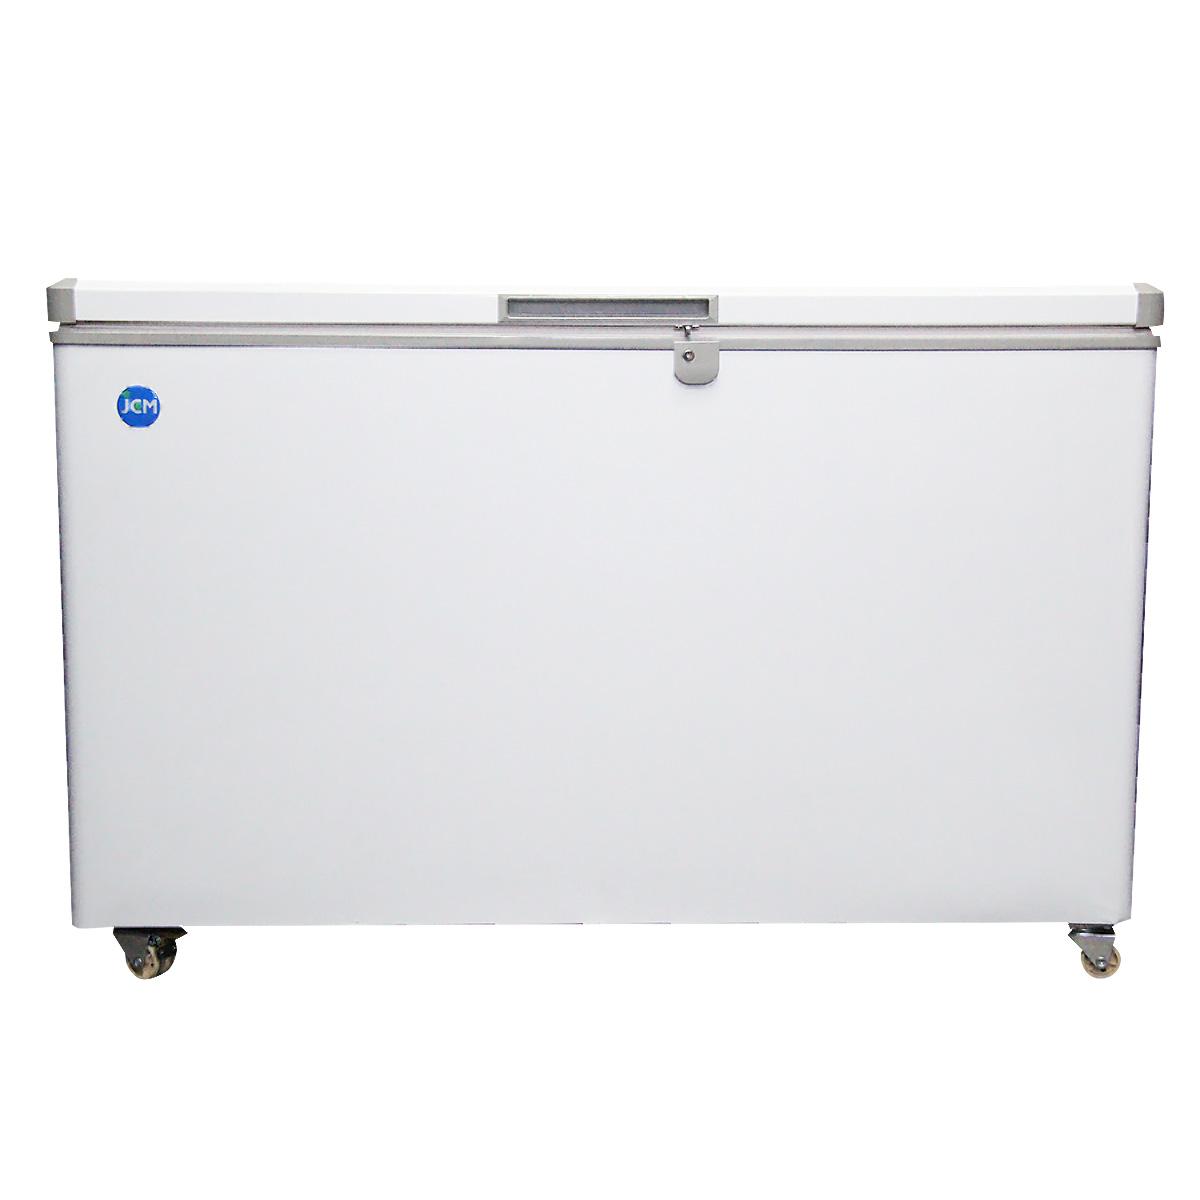 JCM 冷凍ストッカー 375L JCMC-385 業務用 冷凍庫 ストッカー 保冷庫 【代引不可】